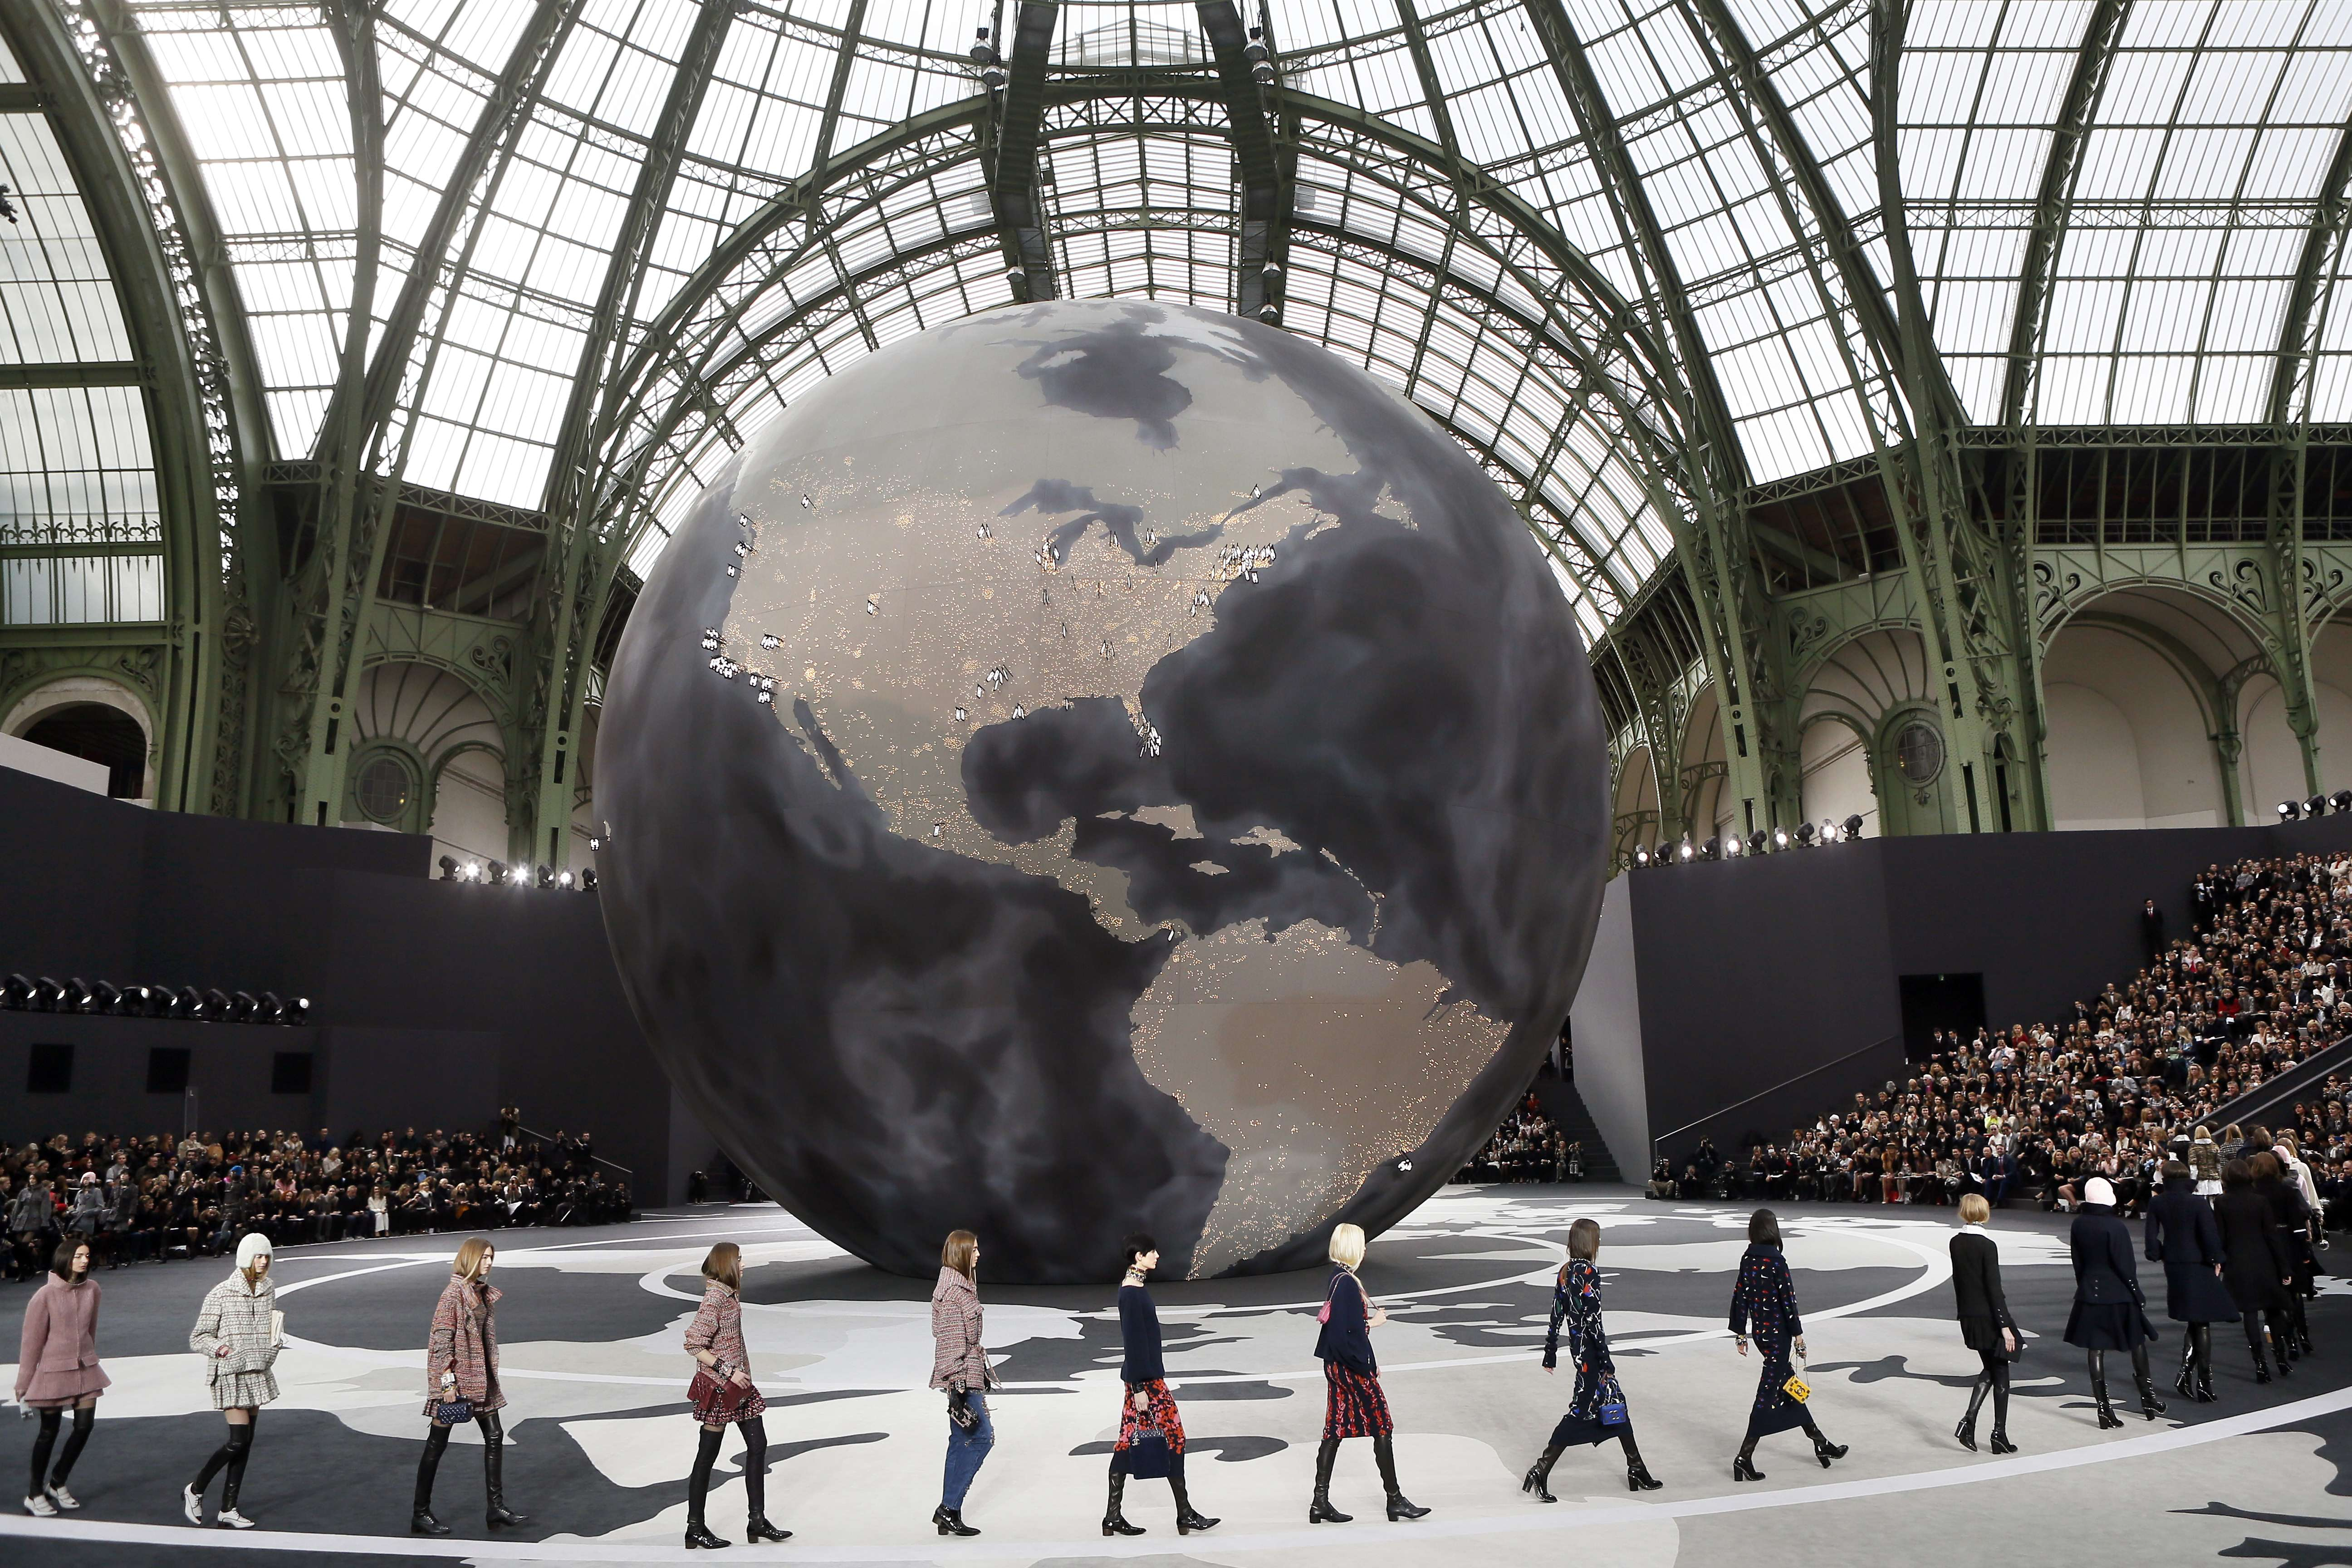 Chanel: The global brand at Paris Fashion Week